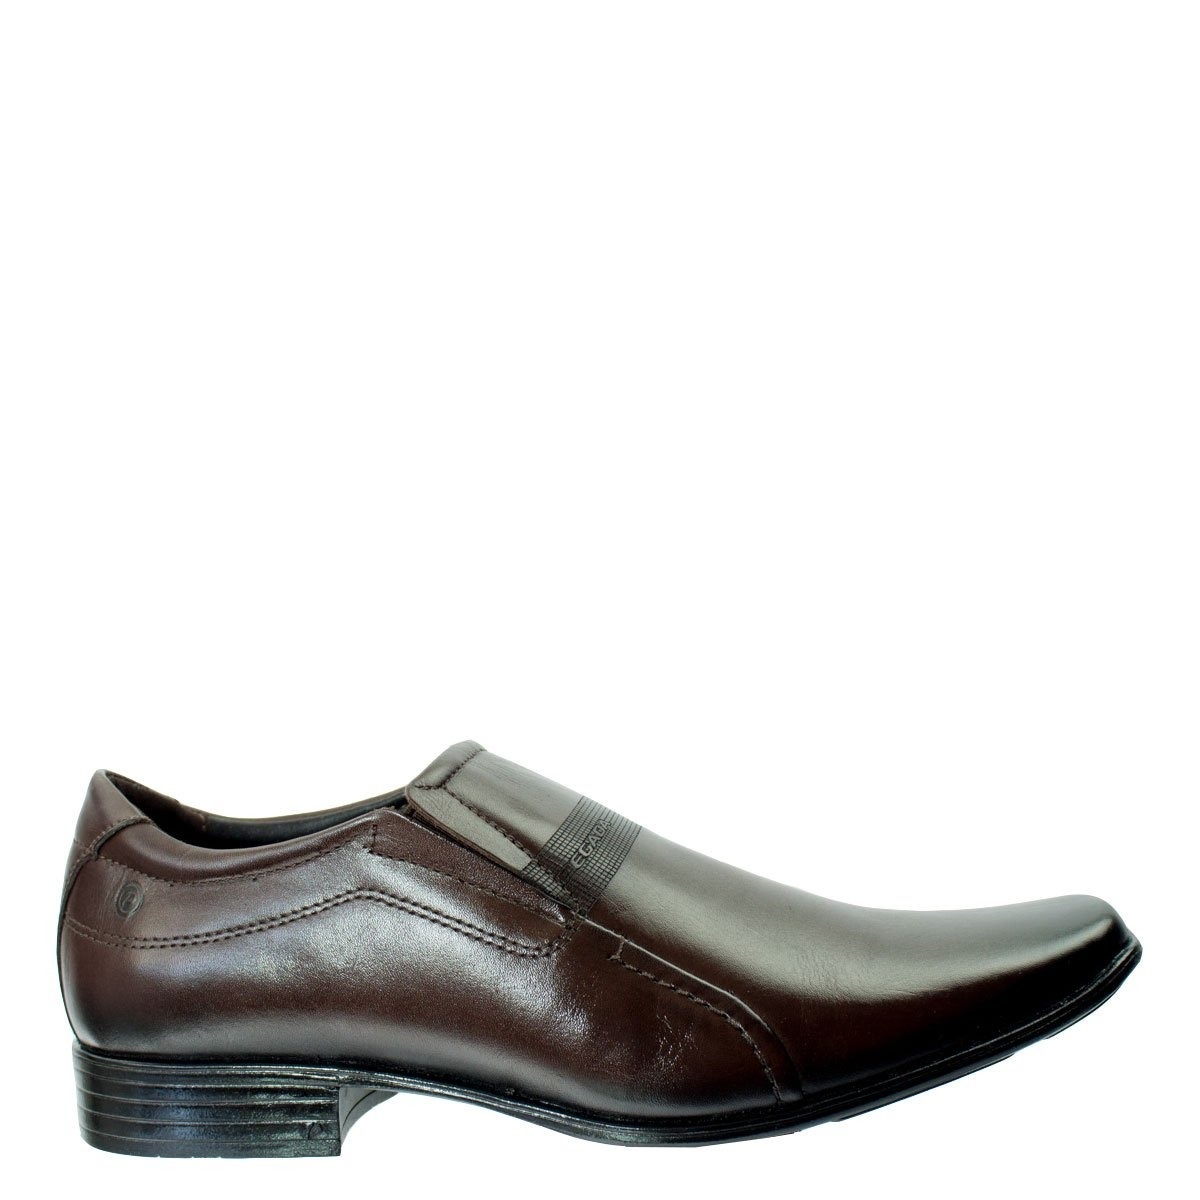 eb21194065 Sapato Social Masculino Pegada Anilina 124606-03 - R$ 149,90 em ...